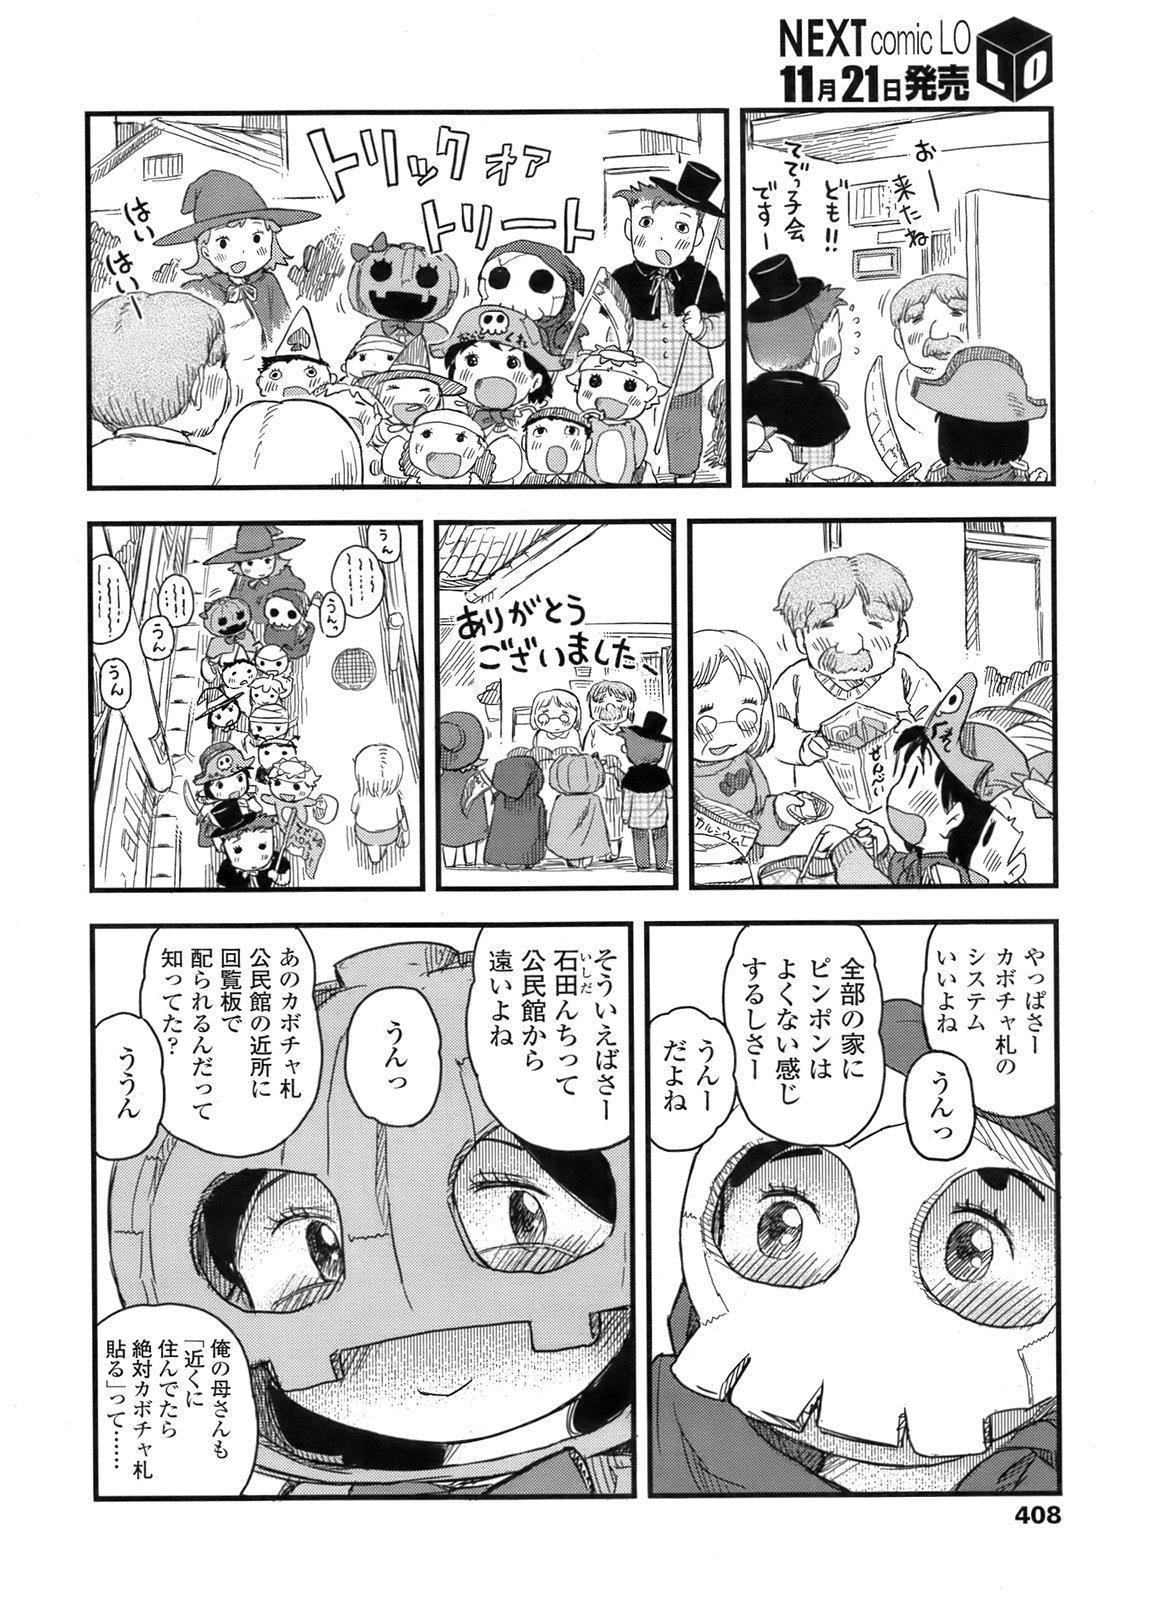 COMIC LO 2011-12 Vol. 93 408